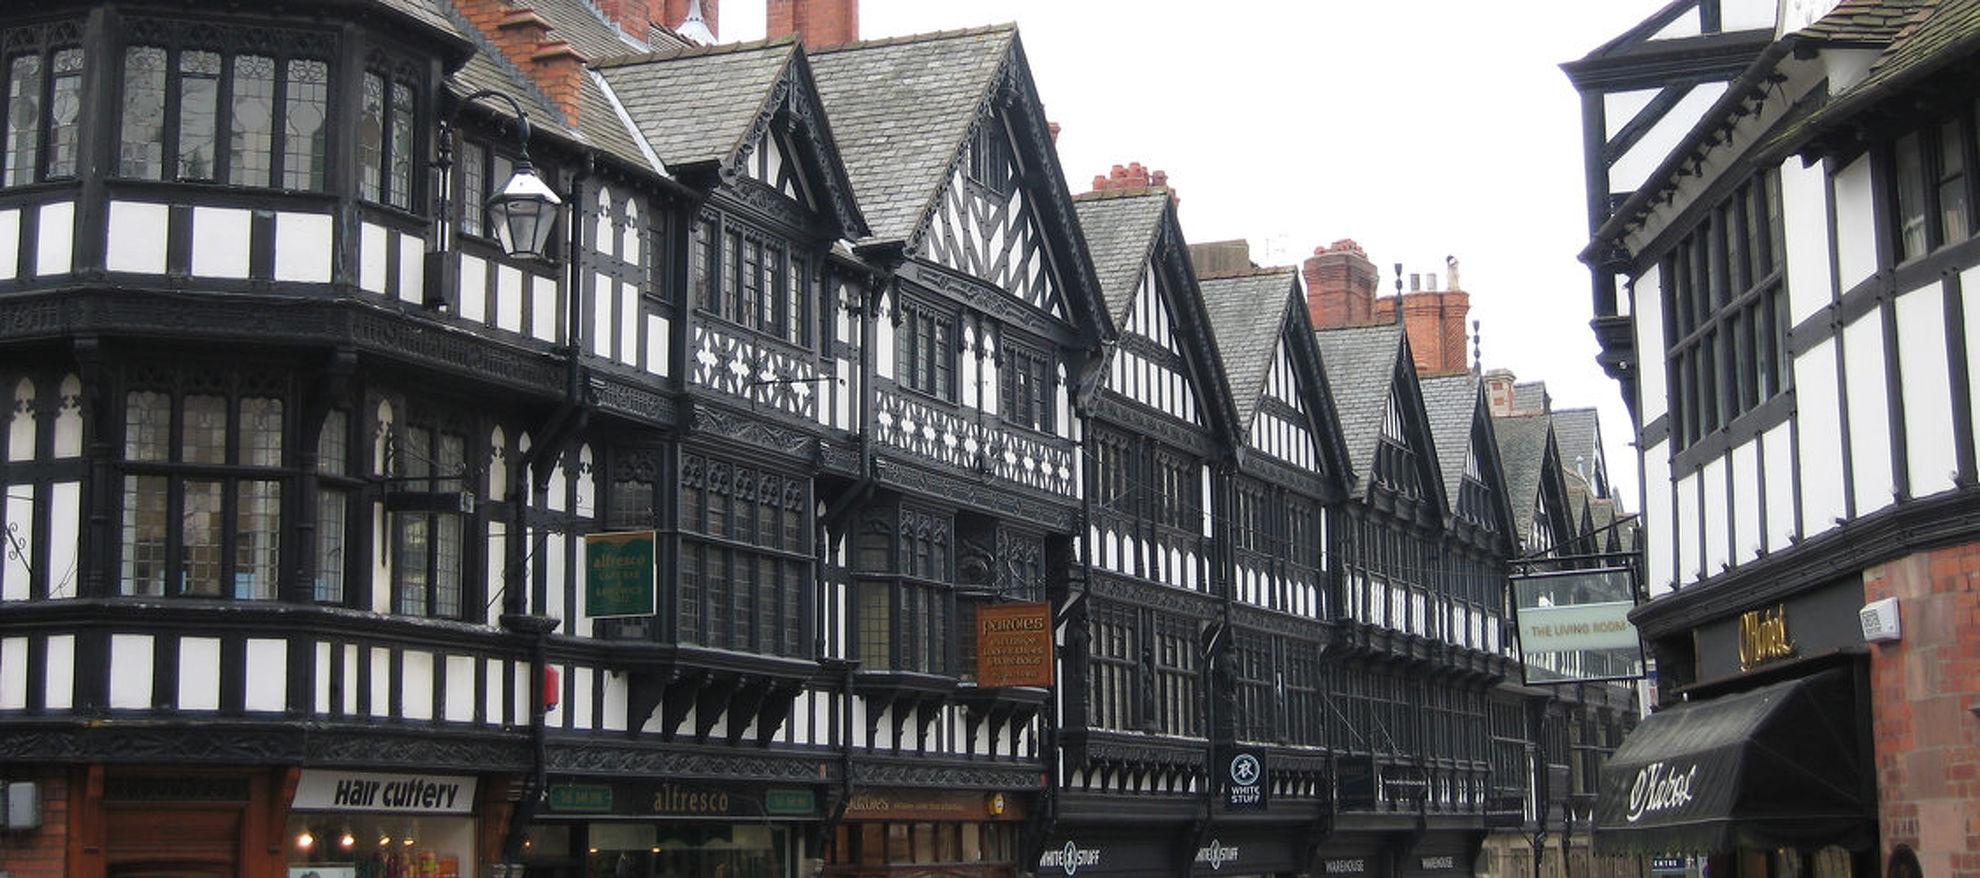 Explore Chester Rows